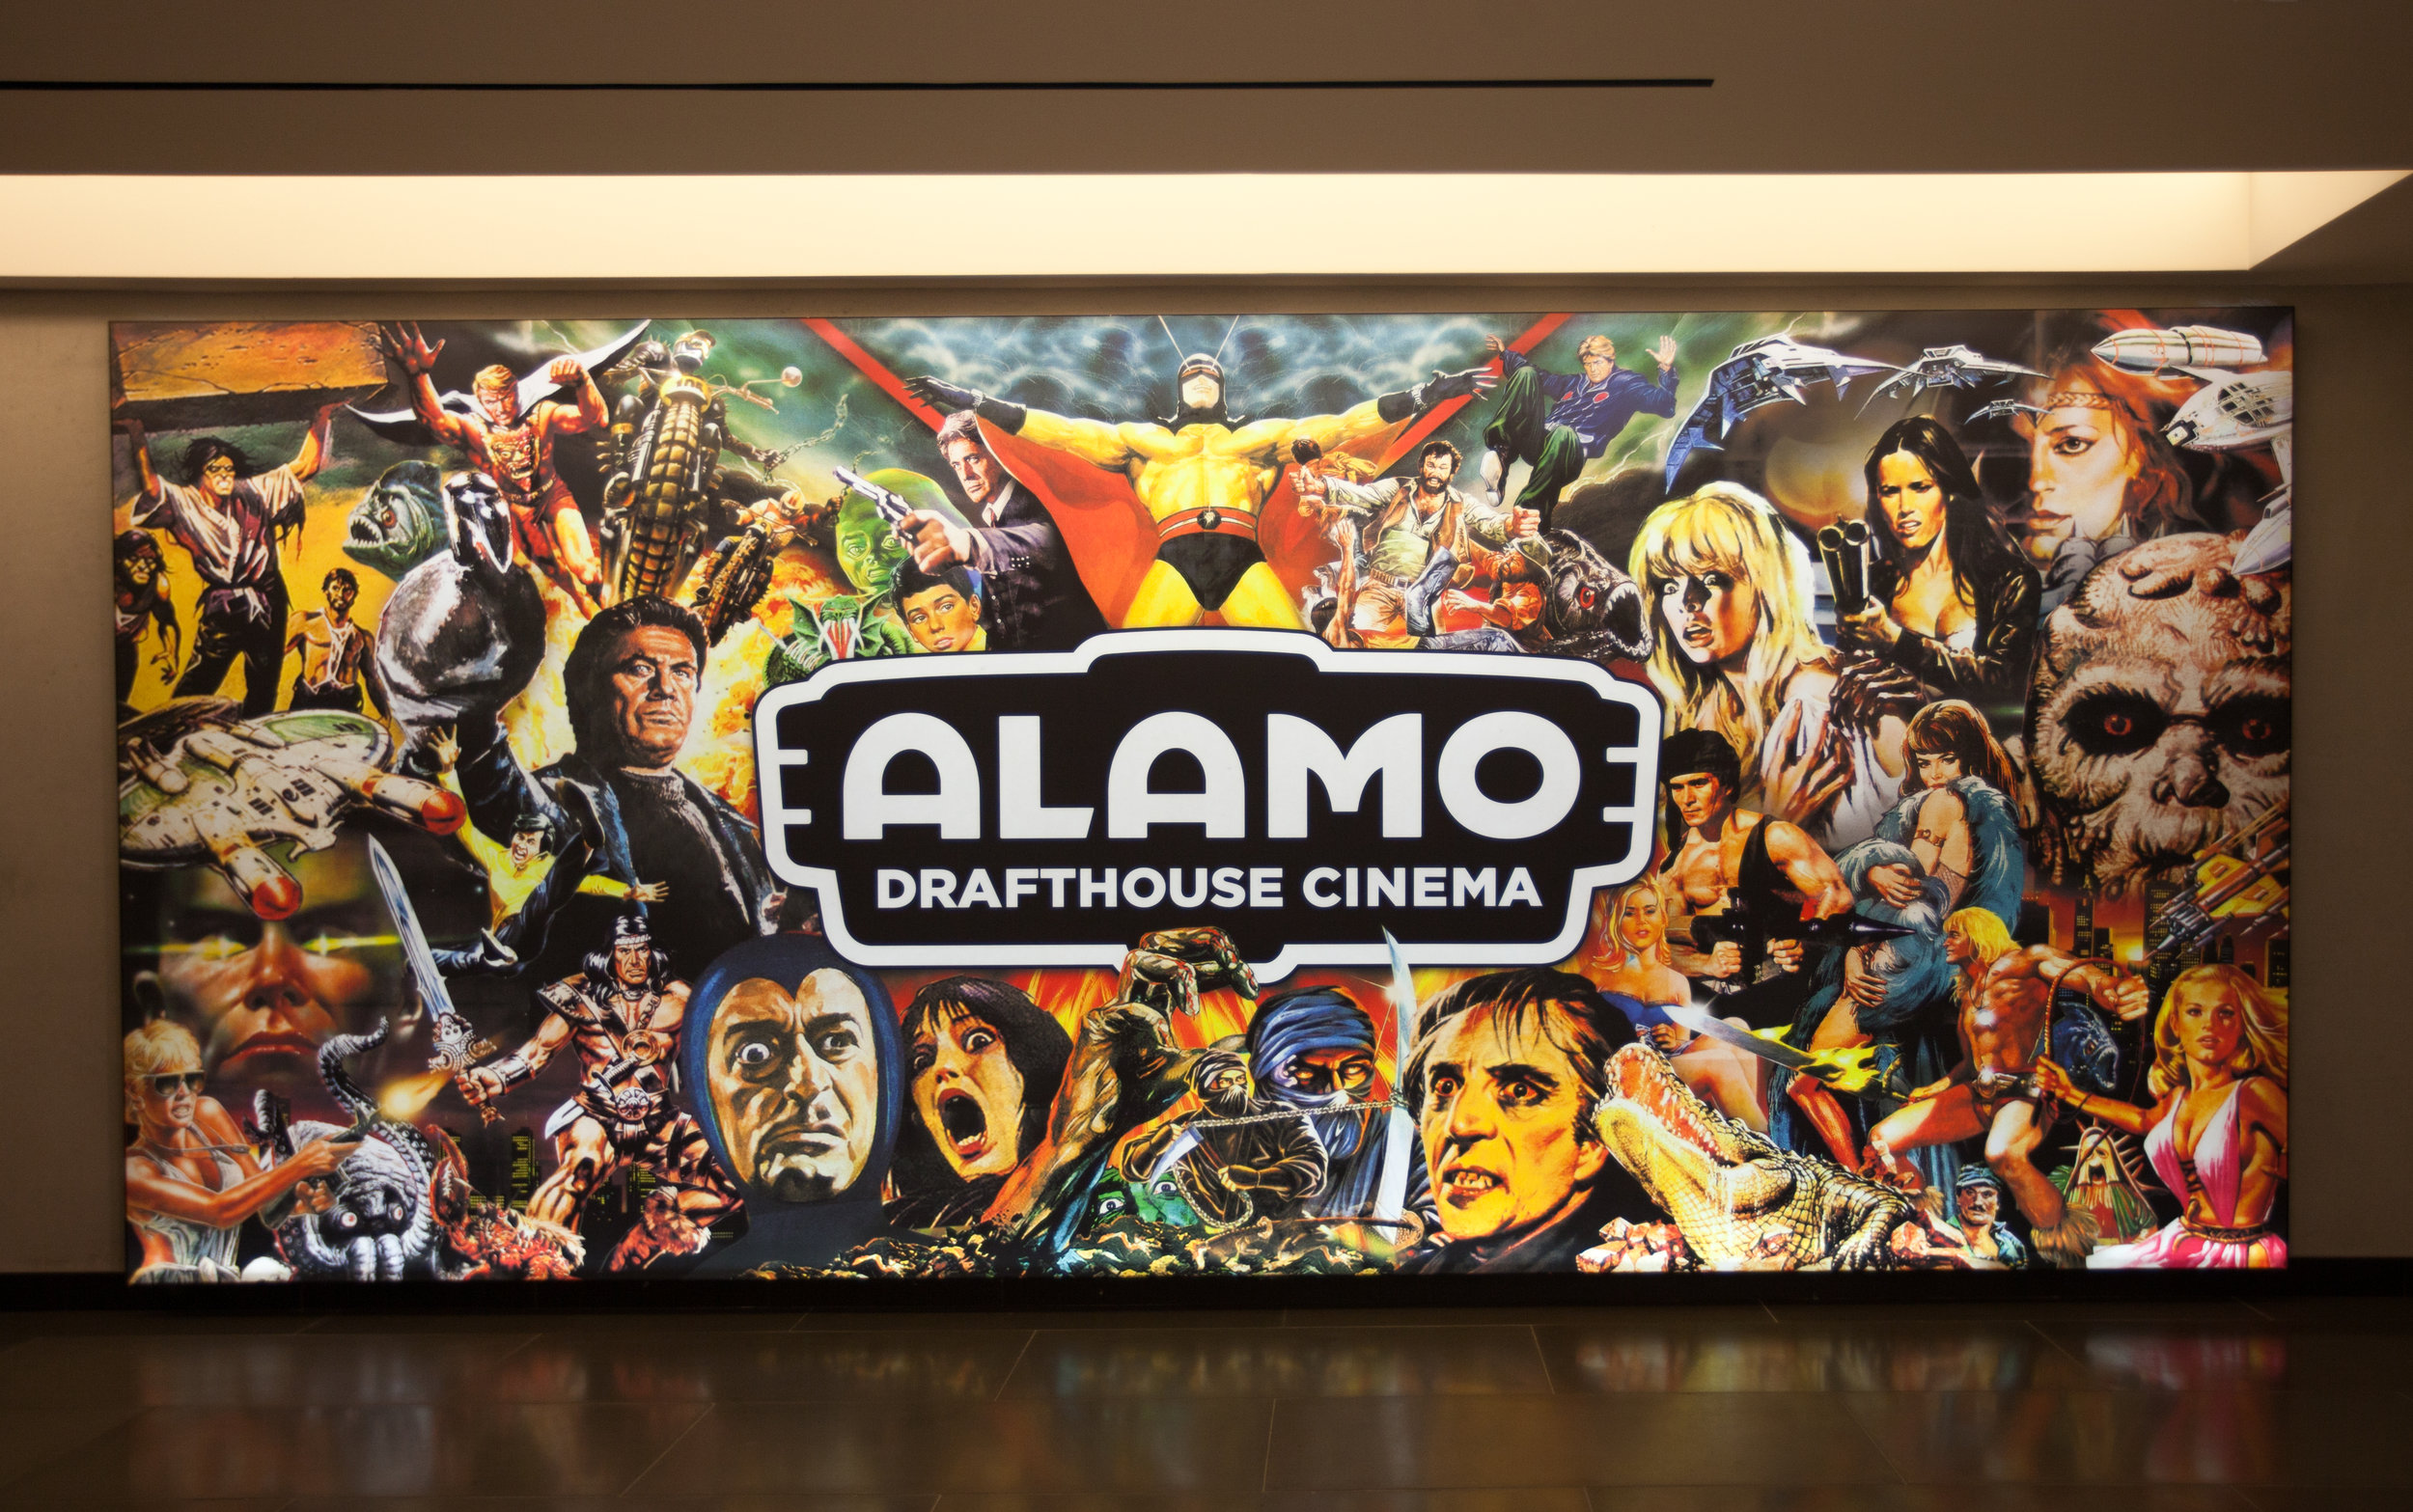 Alamo_Drafthouse (1 of 1).jpg